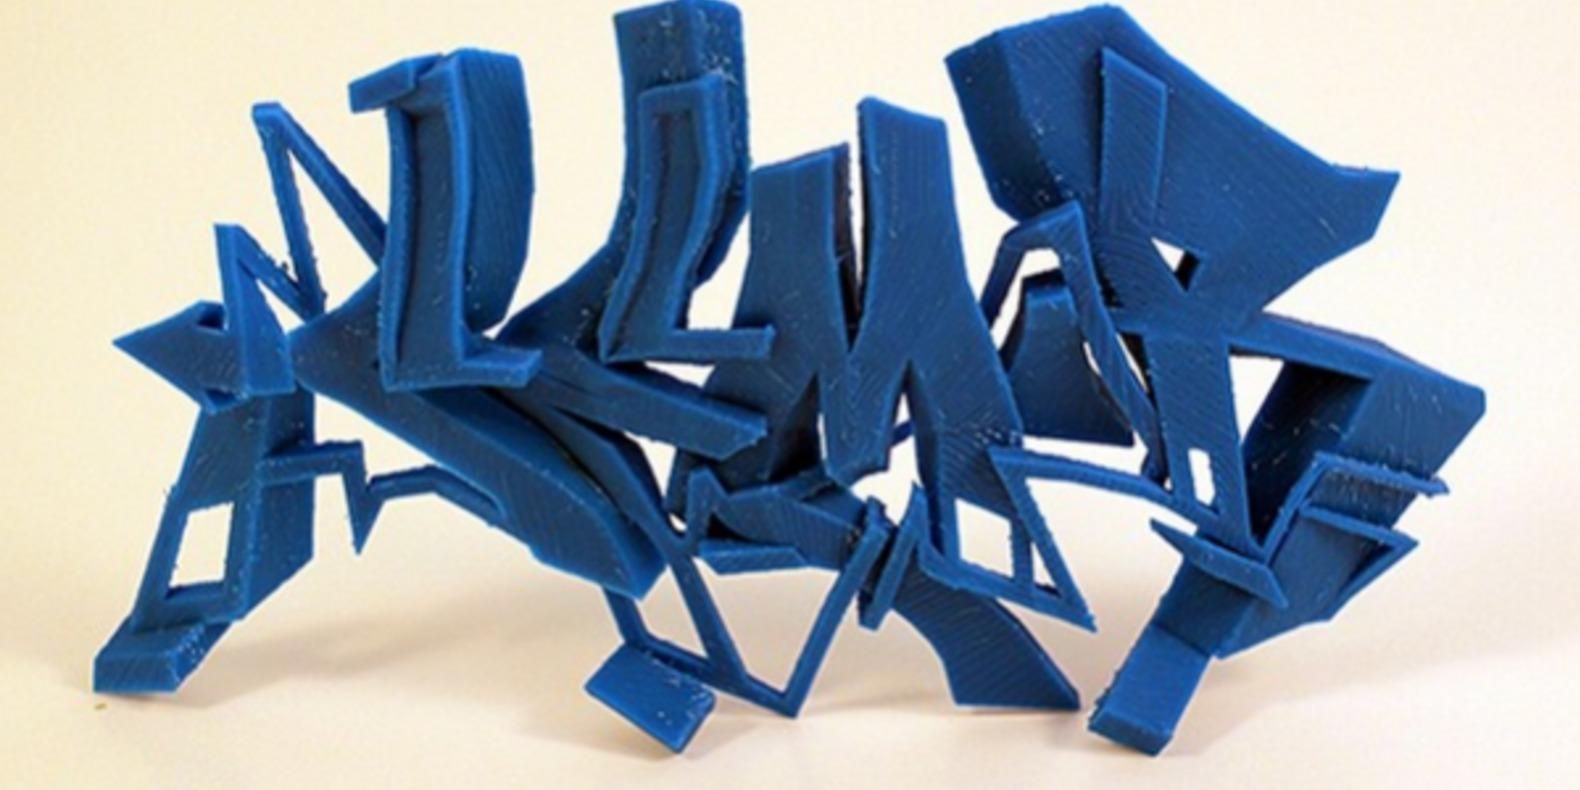 15-SEMOR-3DPrint graffitis imprimés en 3D Noramlly Ben